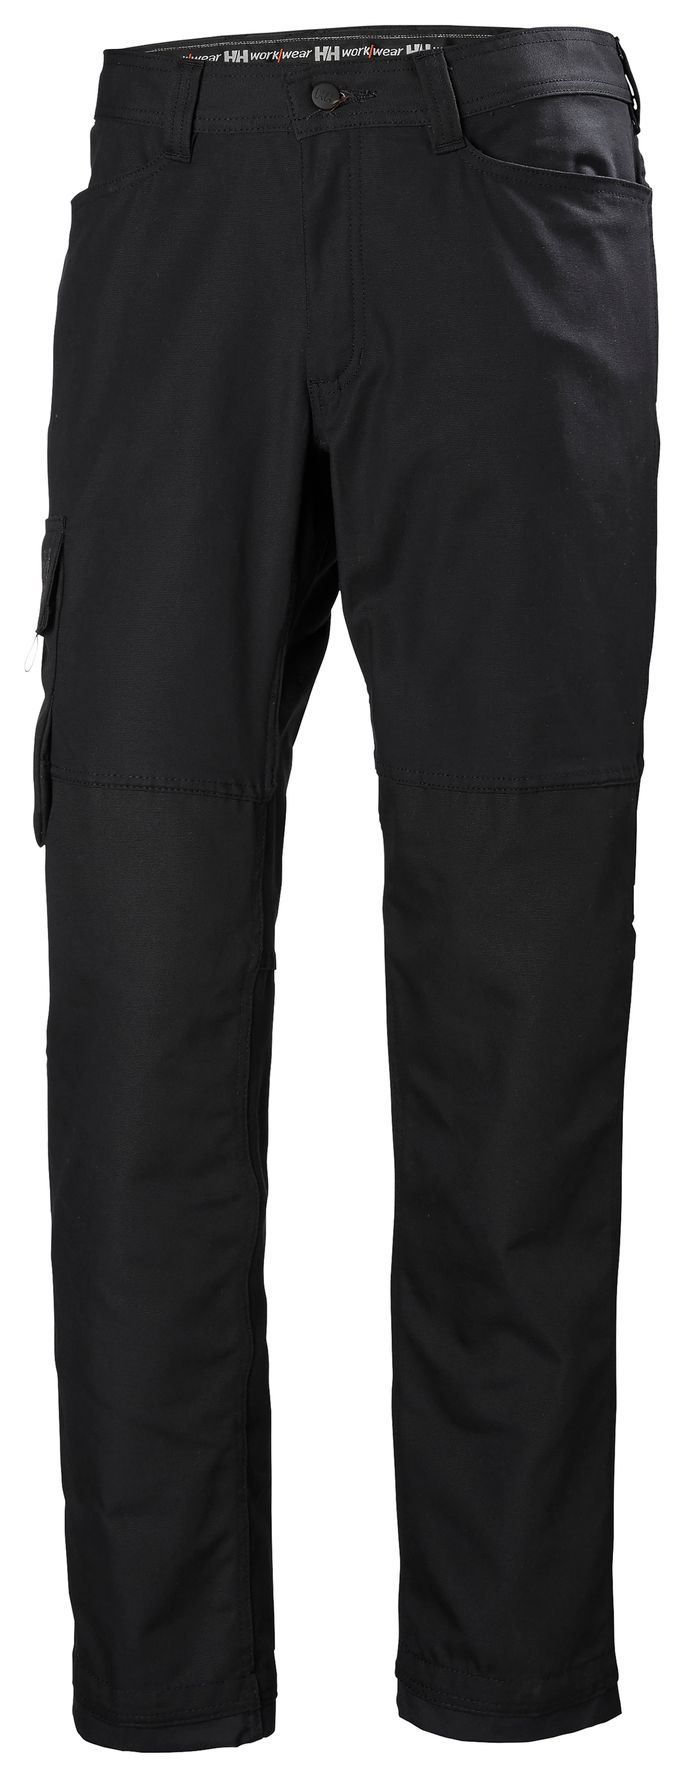 Hose 77460 Oxford Service Pant 990 Black Helly Hansen Shorts